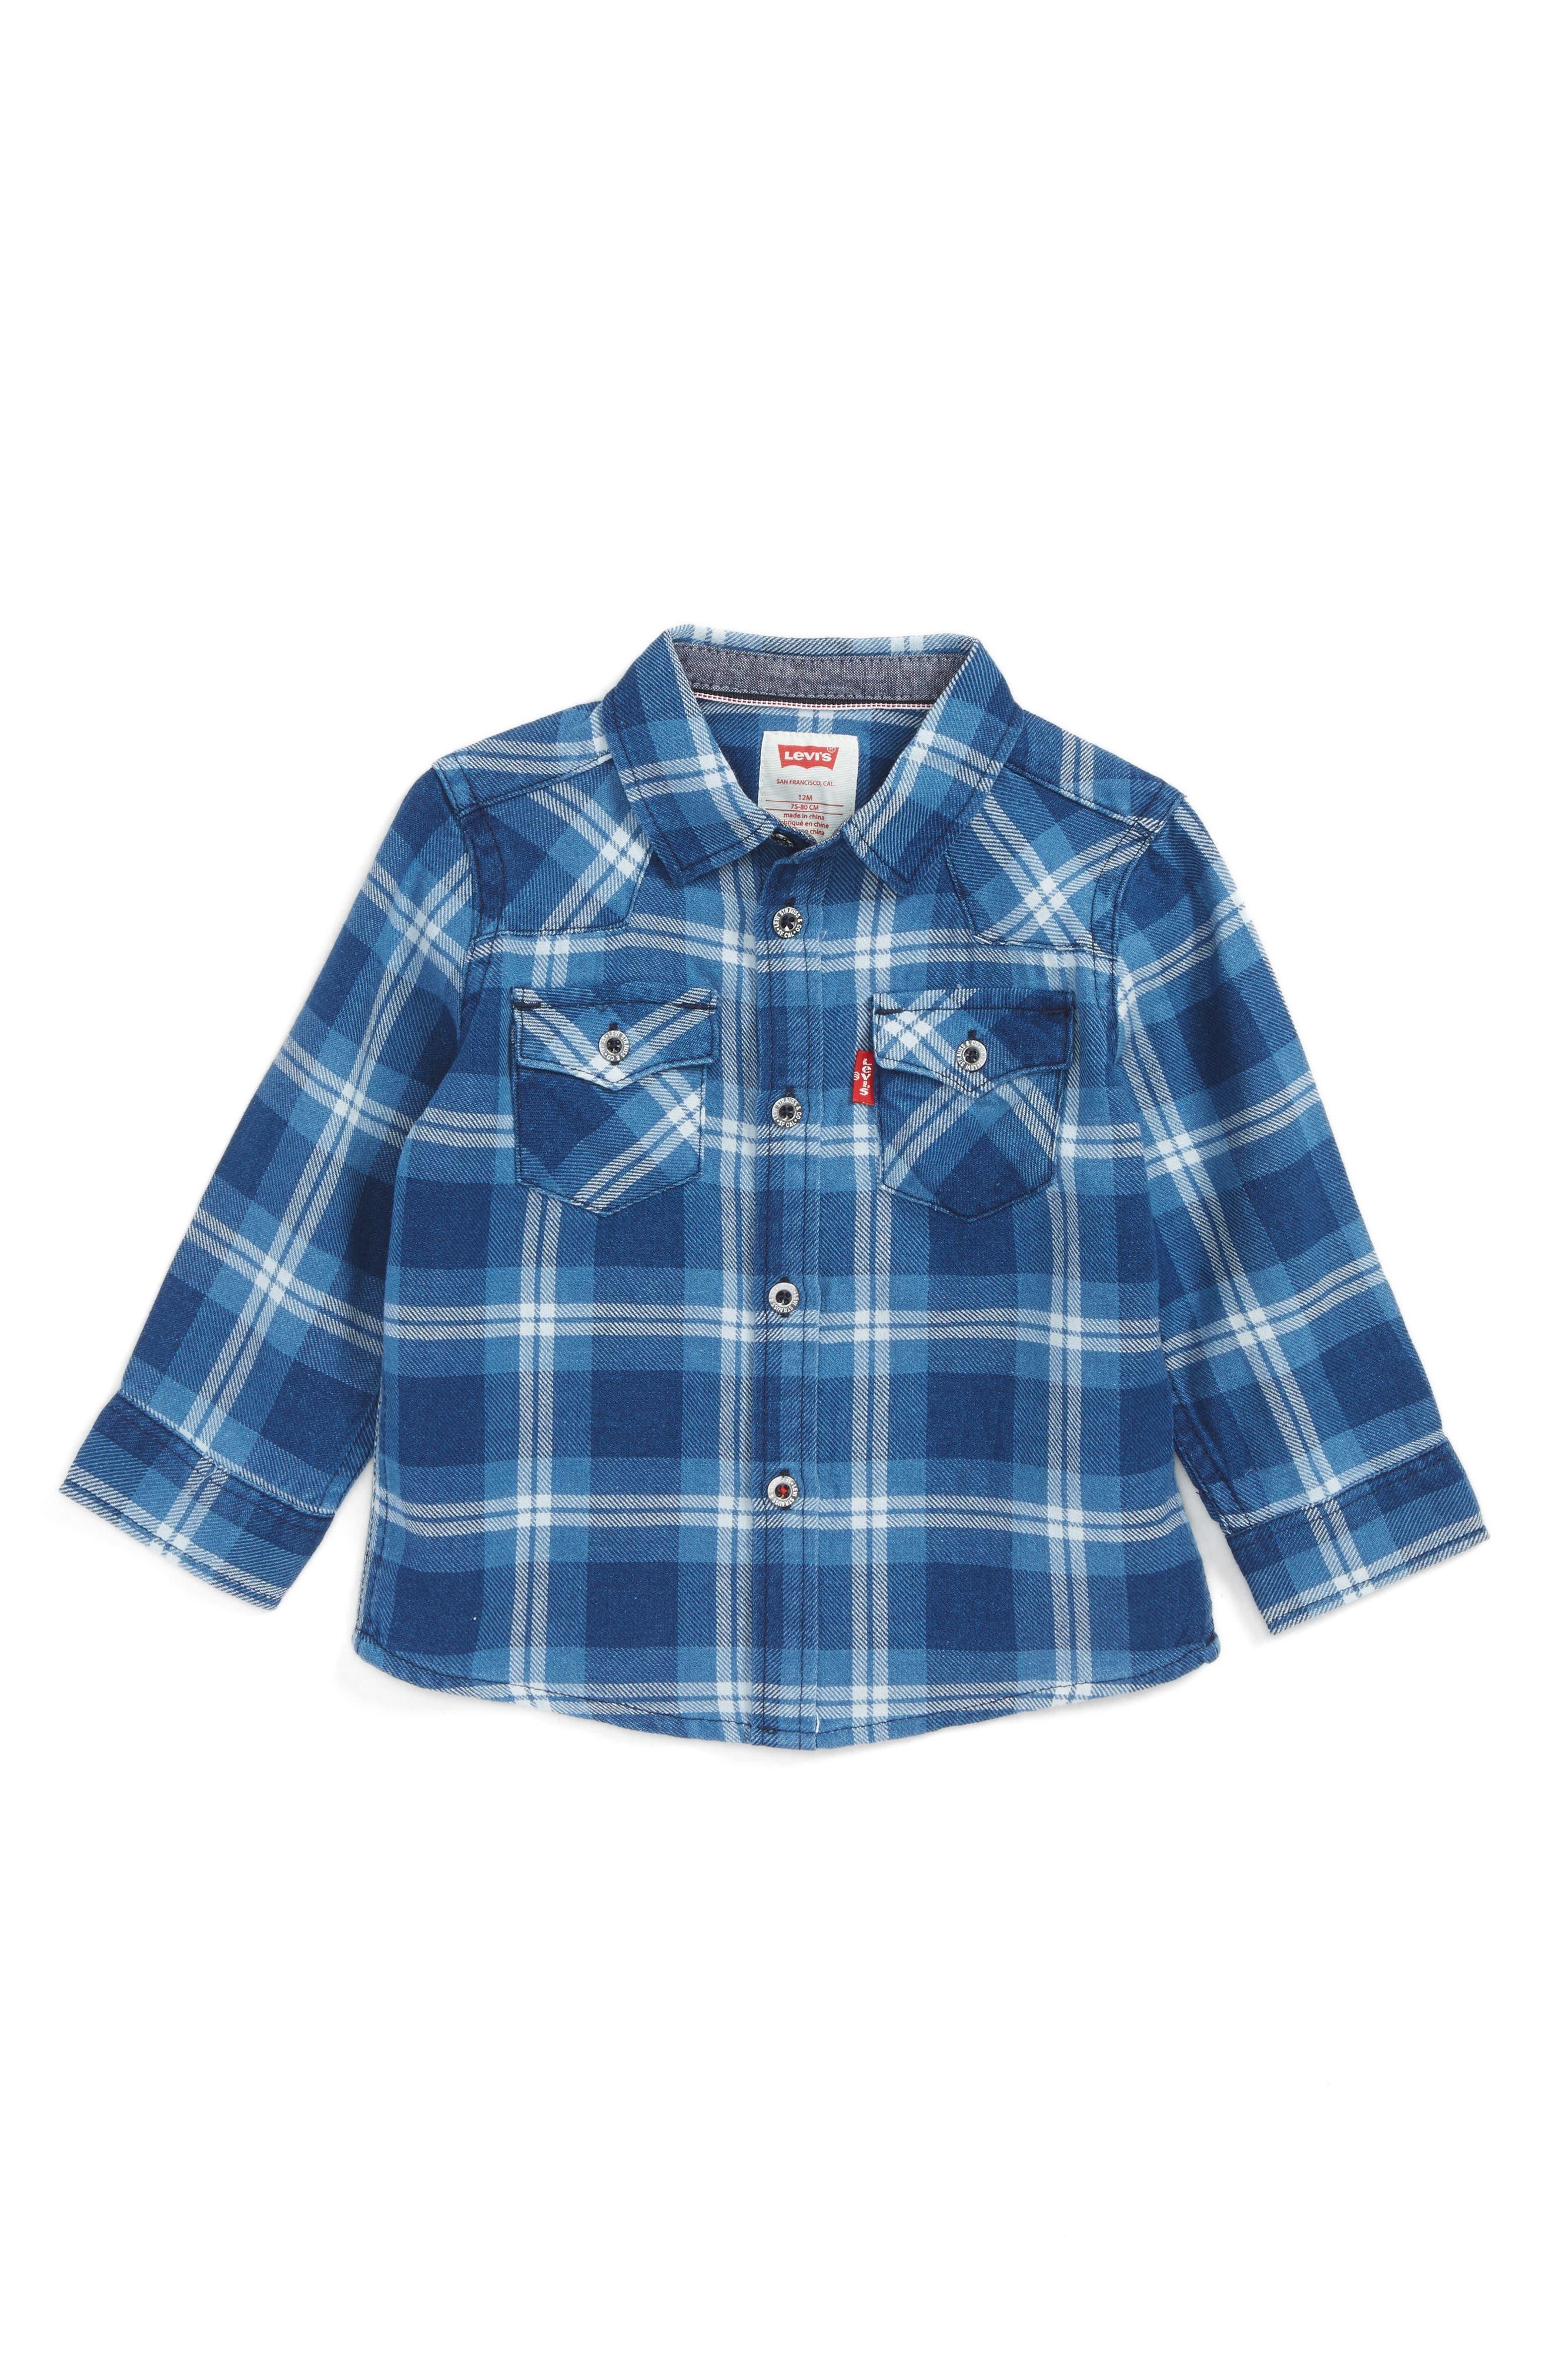 Barstow Plaid Shirt,                             Main thumbnail 1, color,                             463